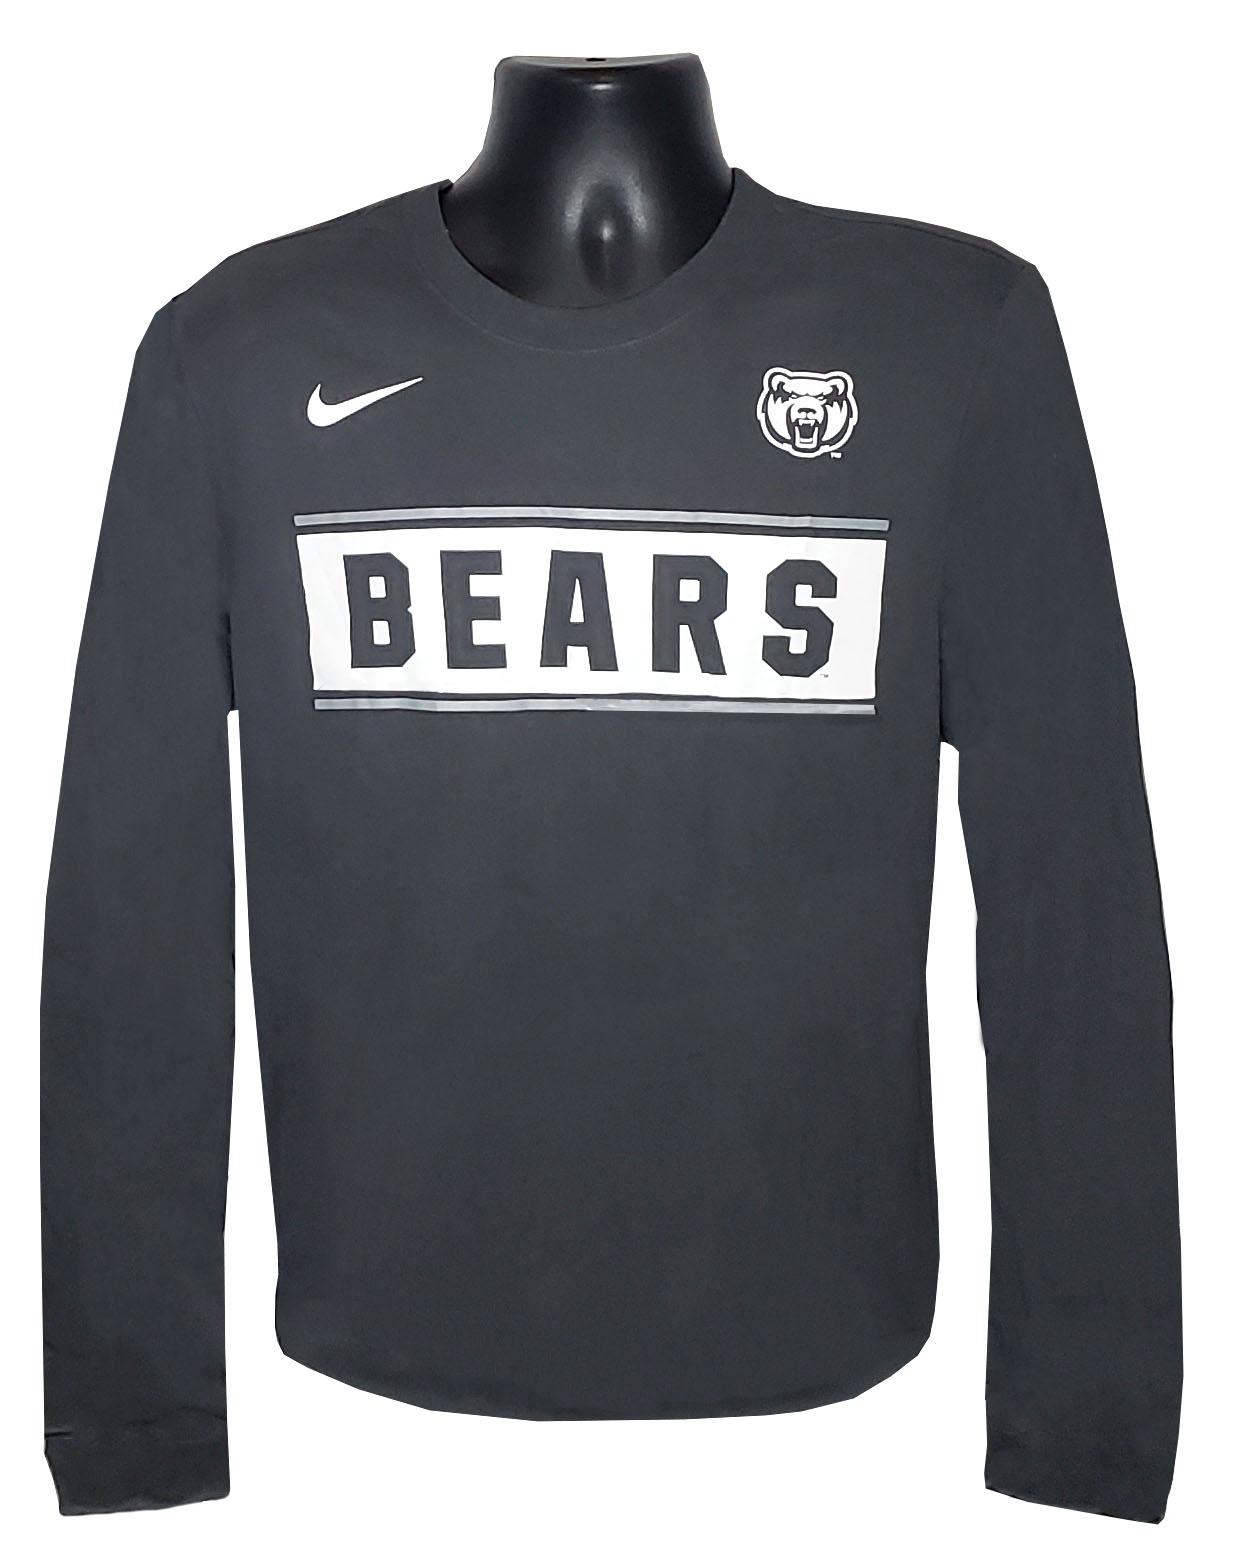 Bears Block LS Tee